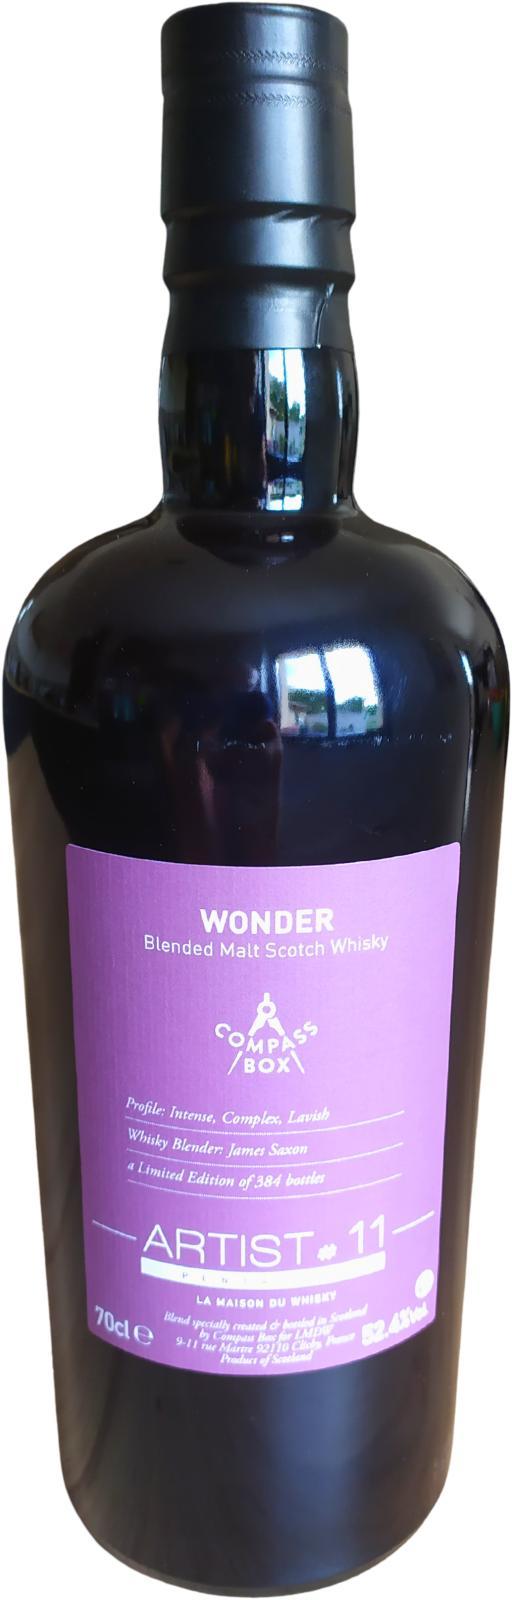 Artist Blend Wonder CB